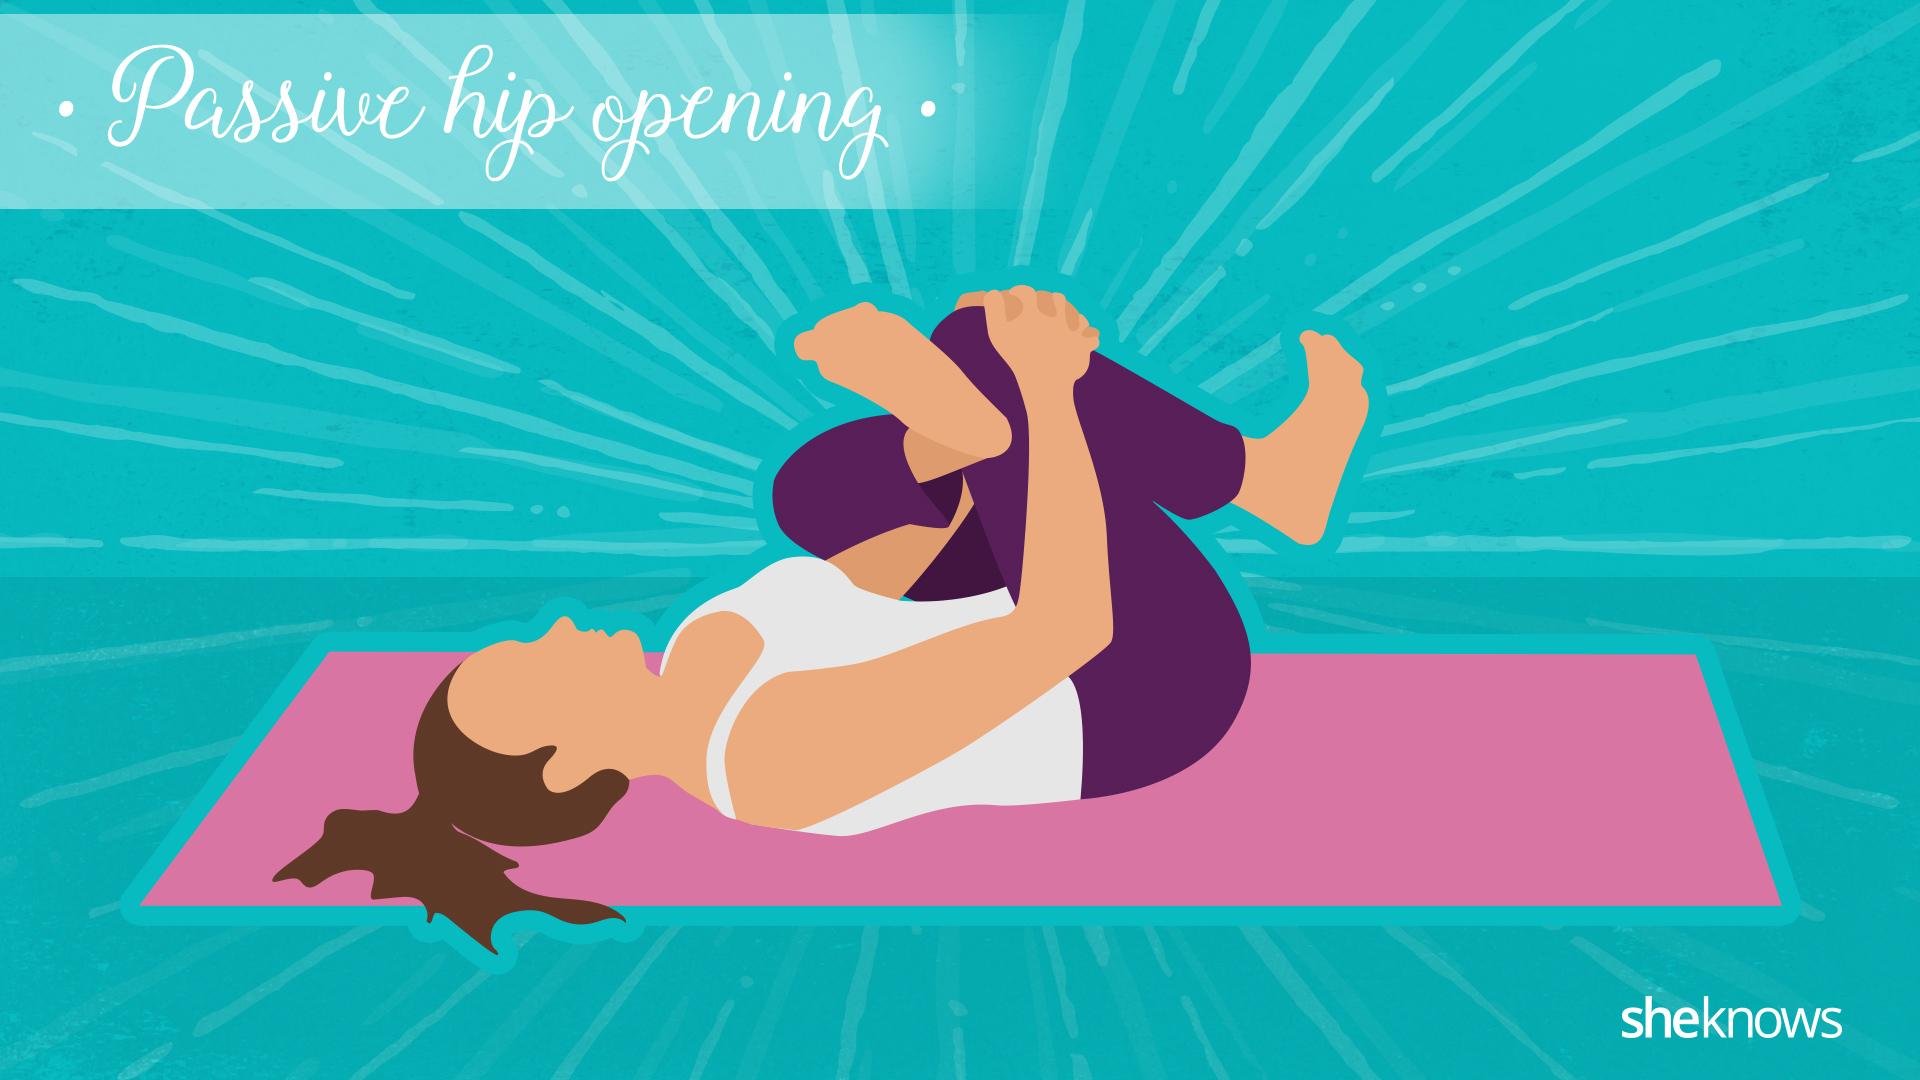 Passive hip opening